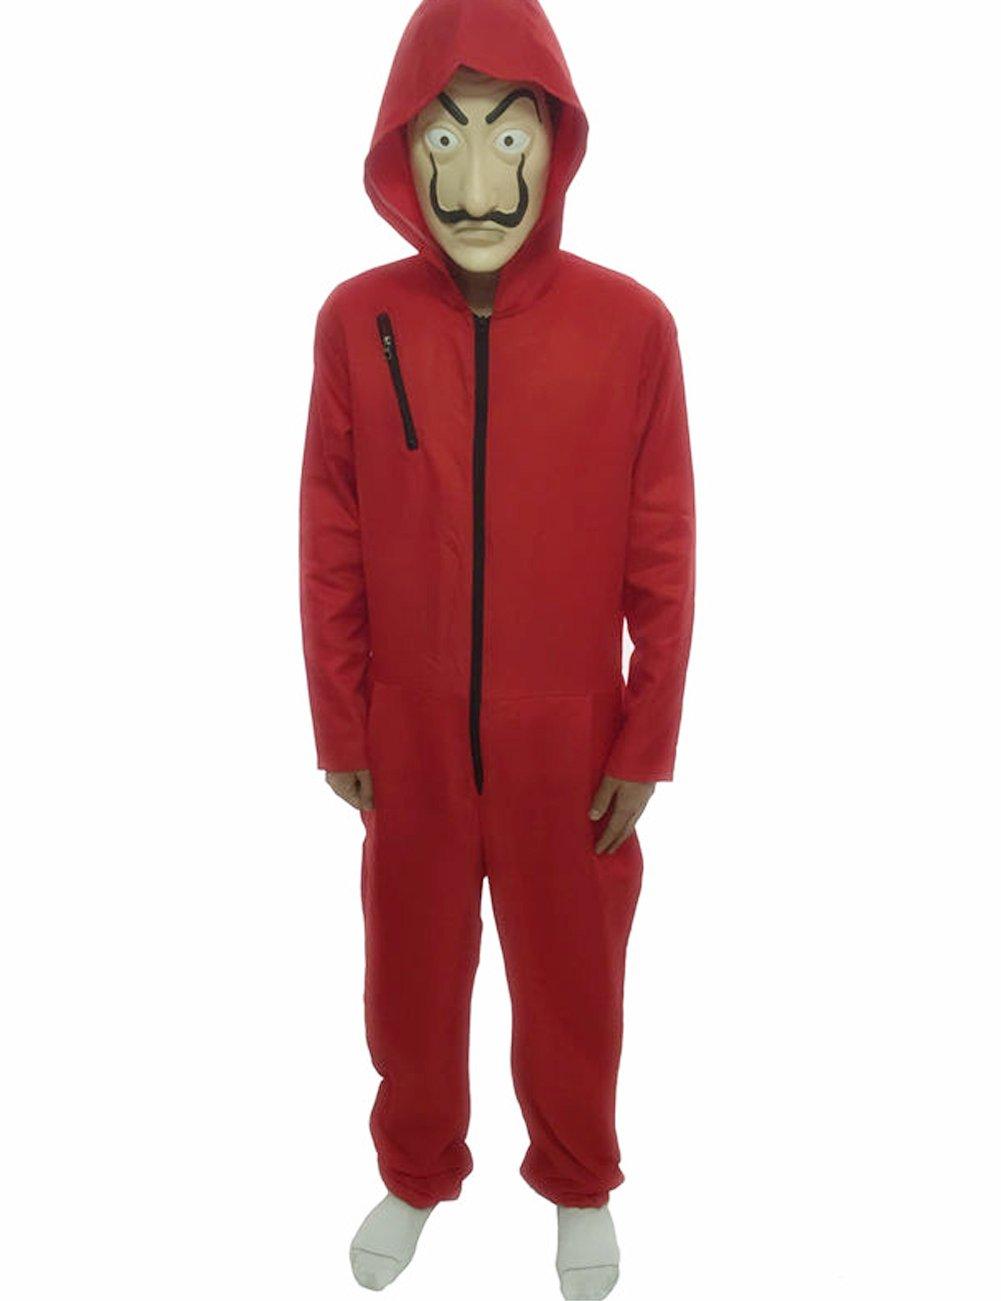 Angelaicos Unisex Dali Mask Red Costume La Casa De Papel Coverall Jumpsuits (M, Full Set)